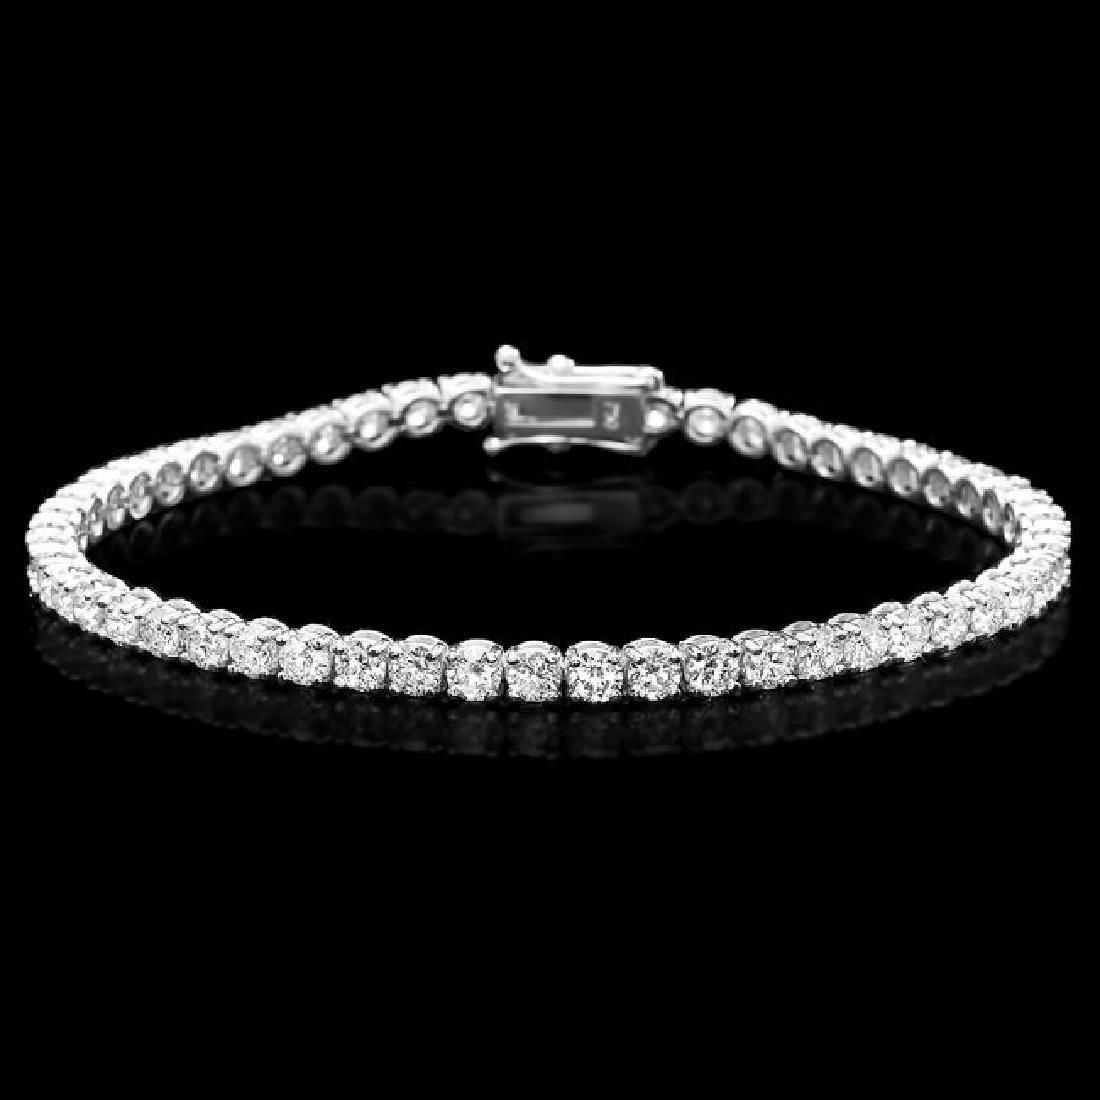 14k White Gold 6.60ct Diamond Bracelet